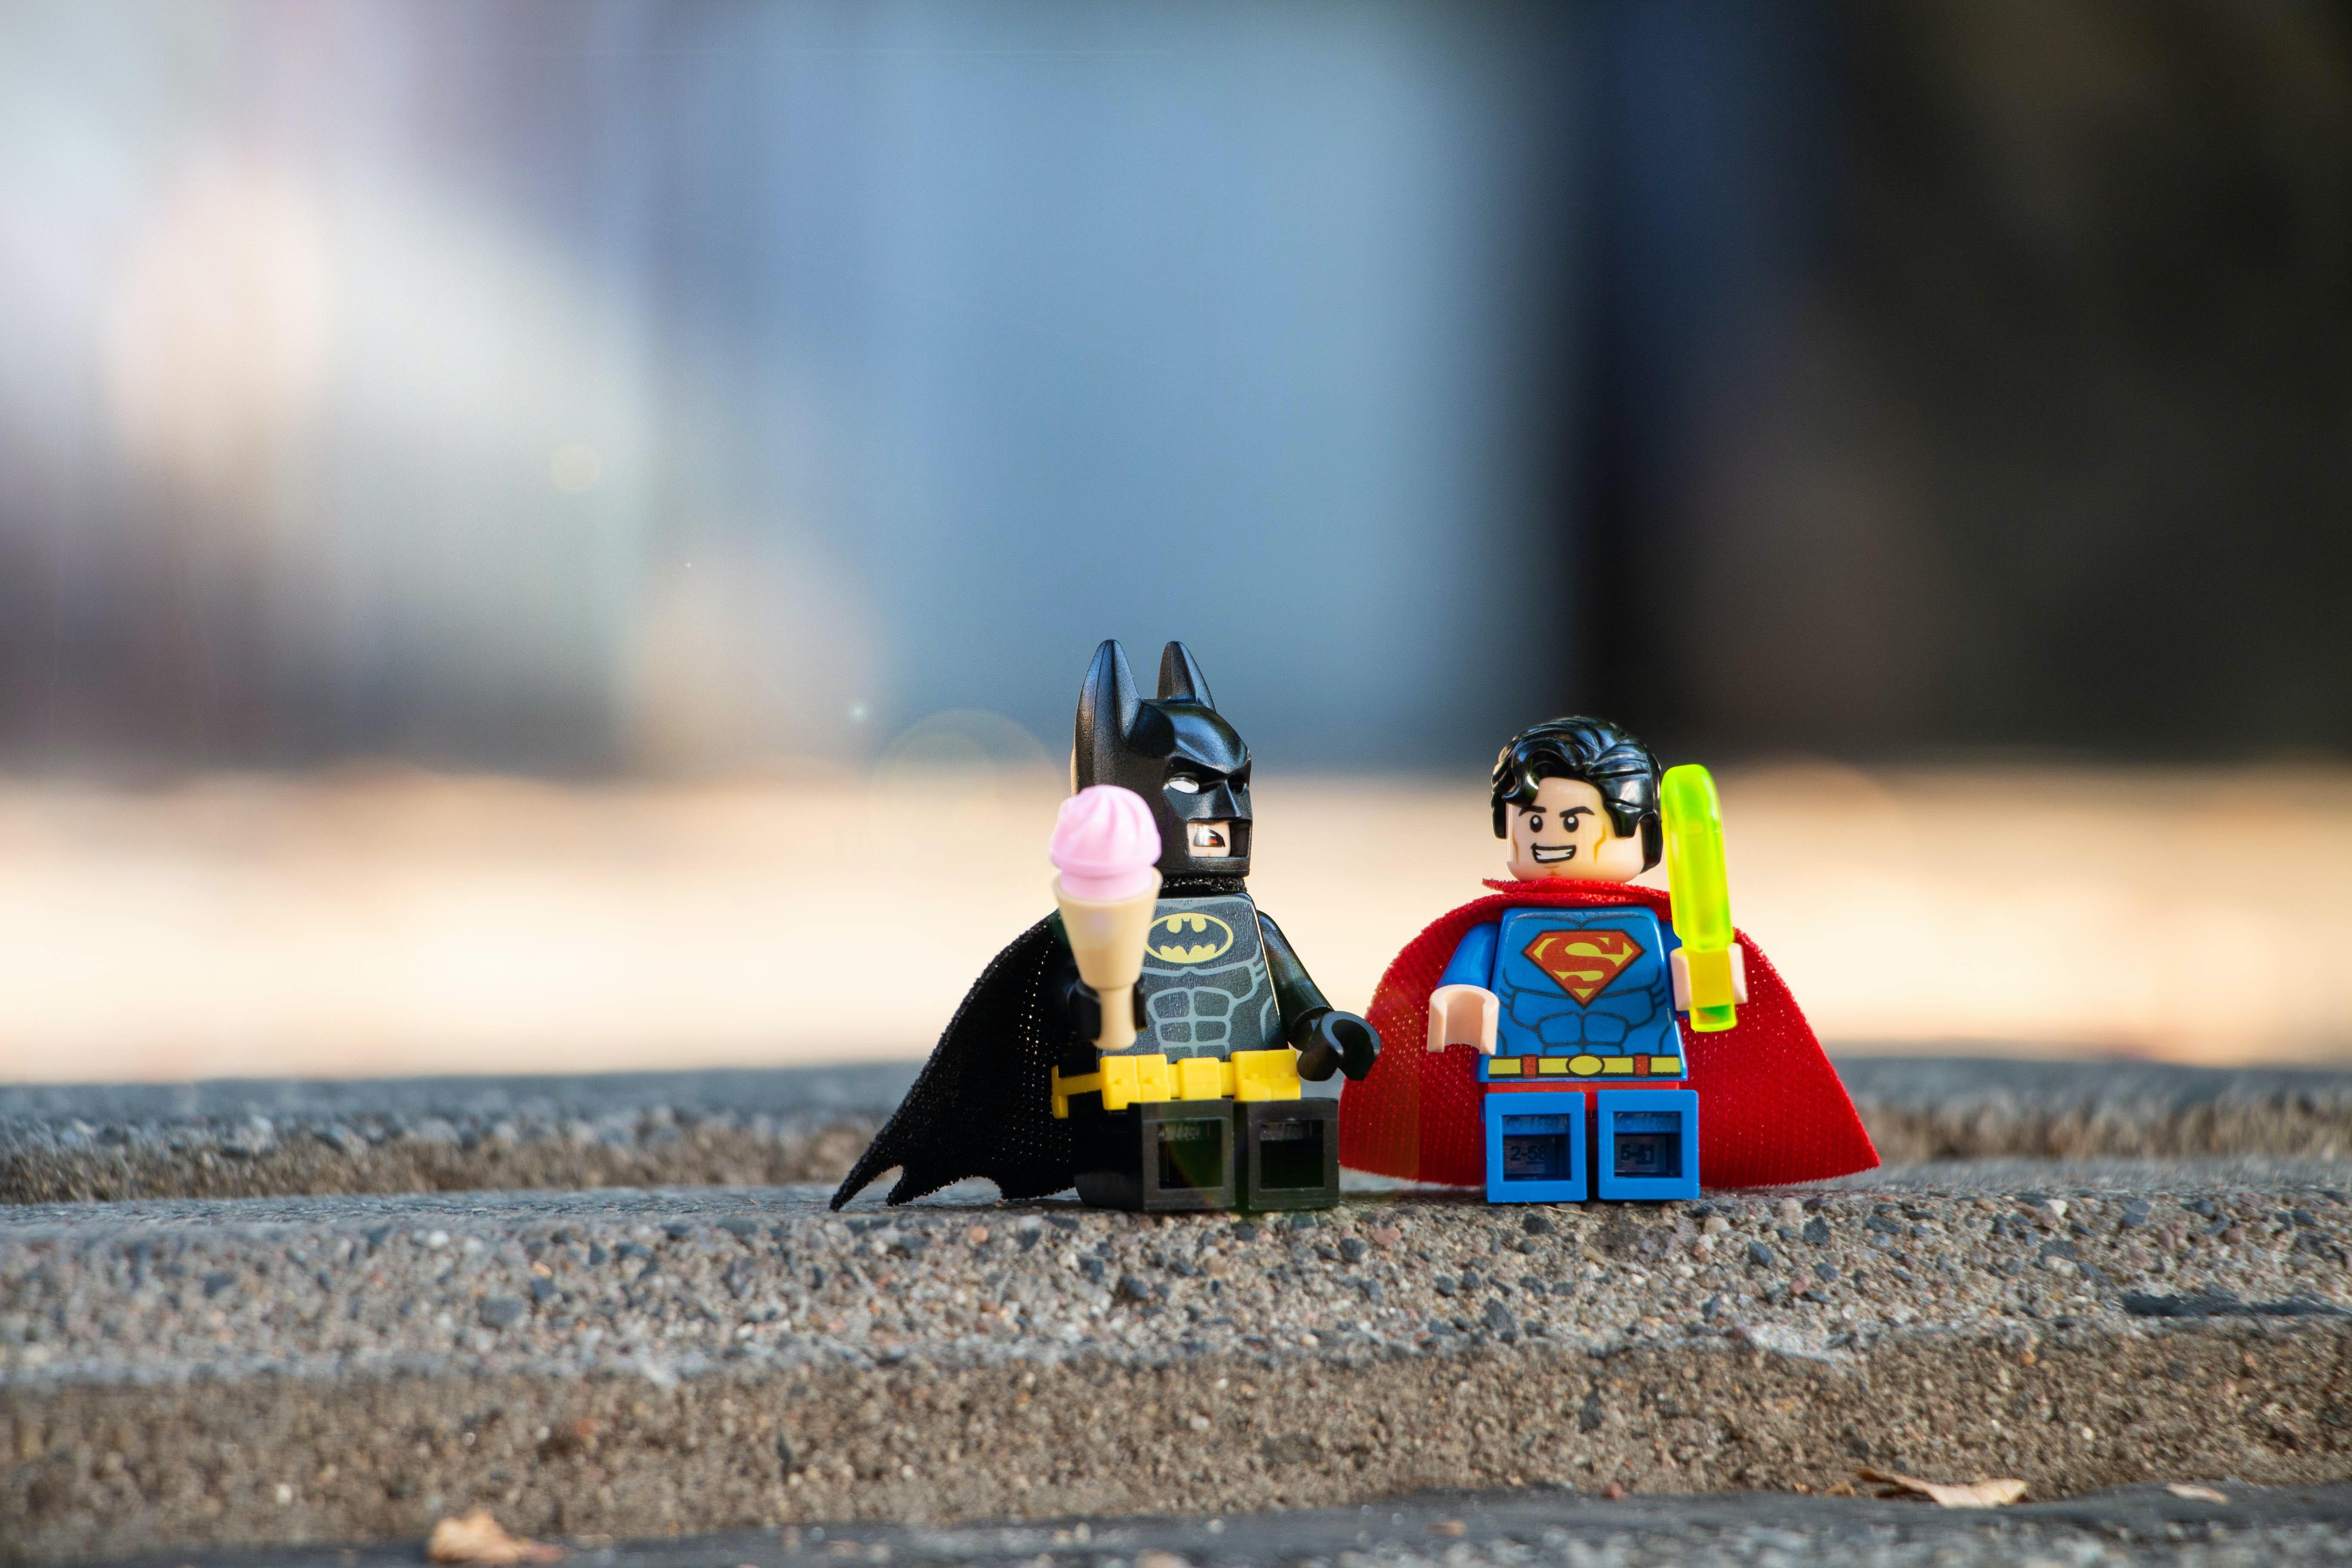 Batman and Superman figurines